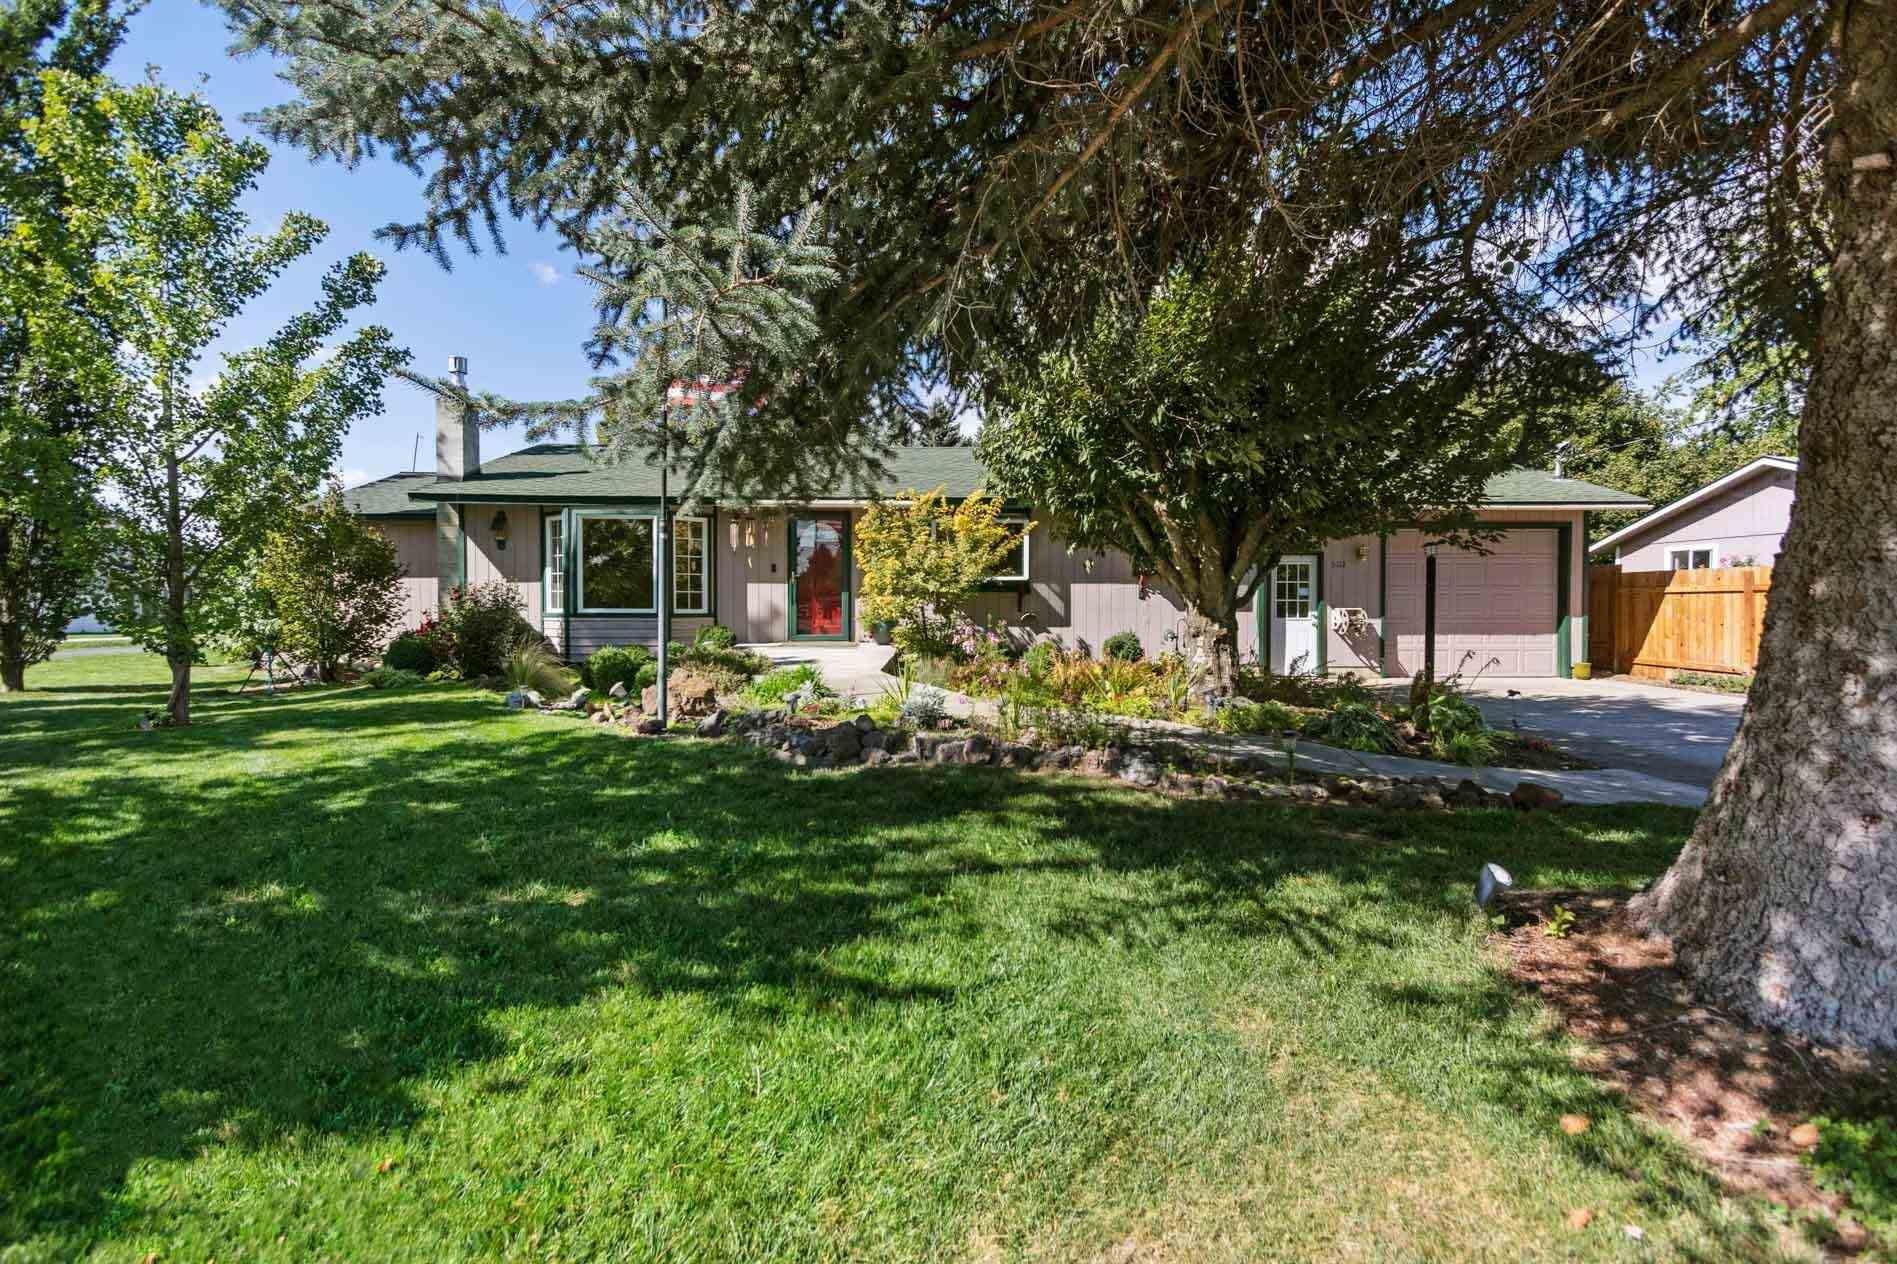 5113 N McDonald Rd, Spokane Valley, WA 99216 - #: 202122495